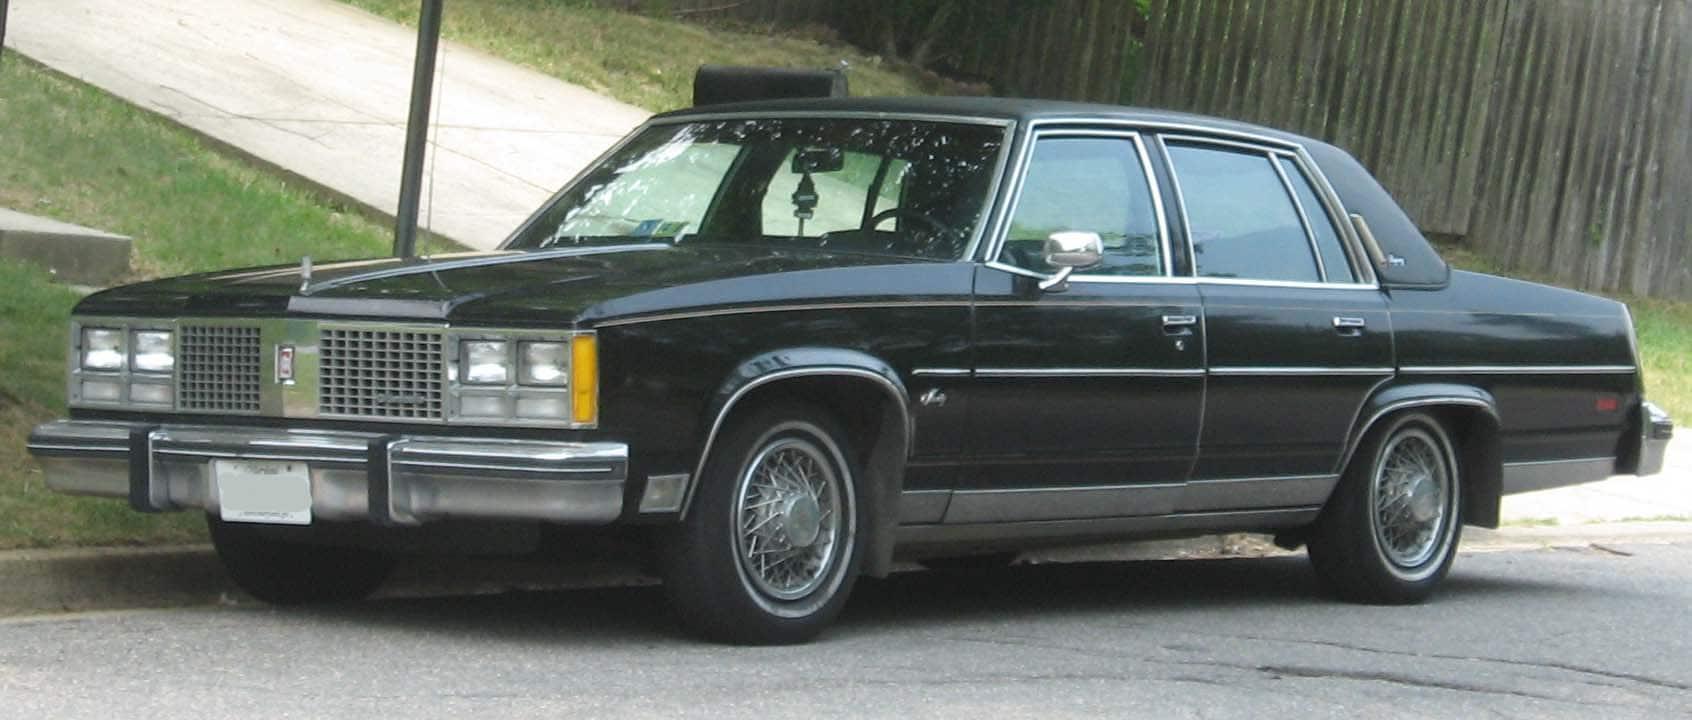 oldsmobile 98 top window repair az